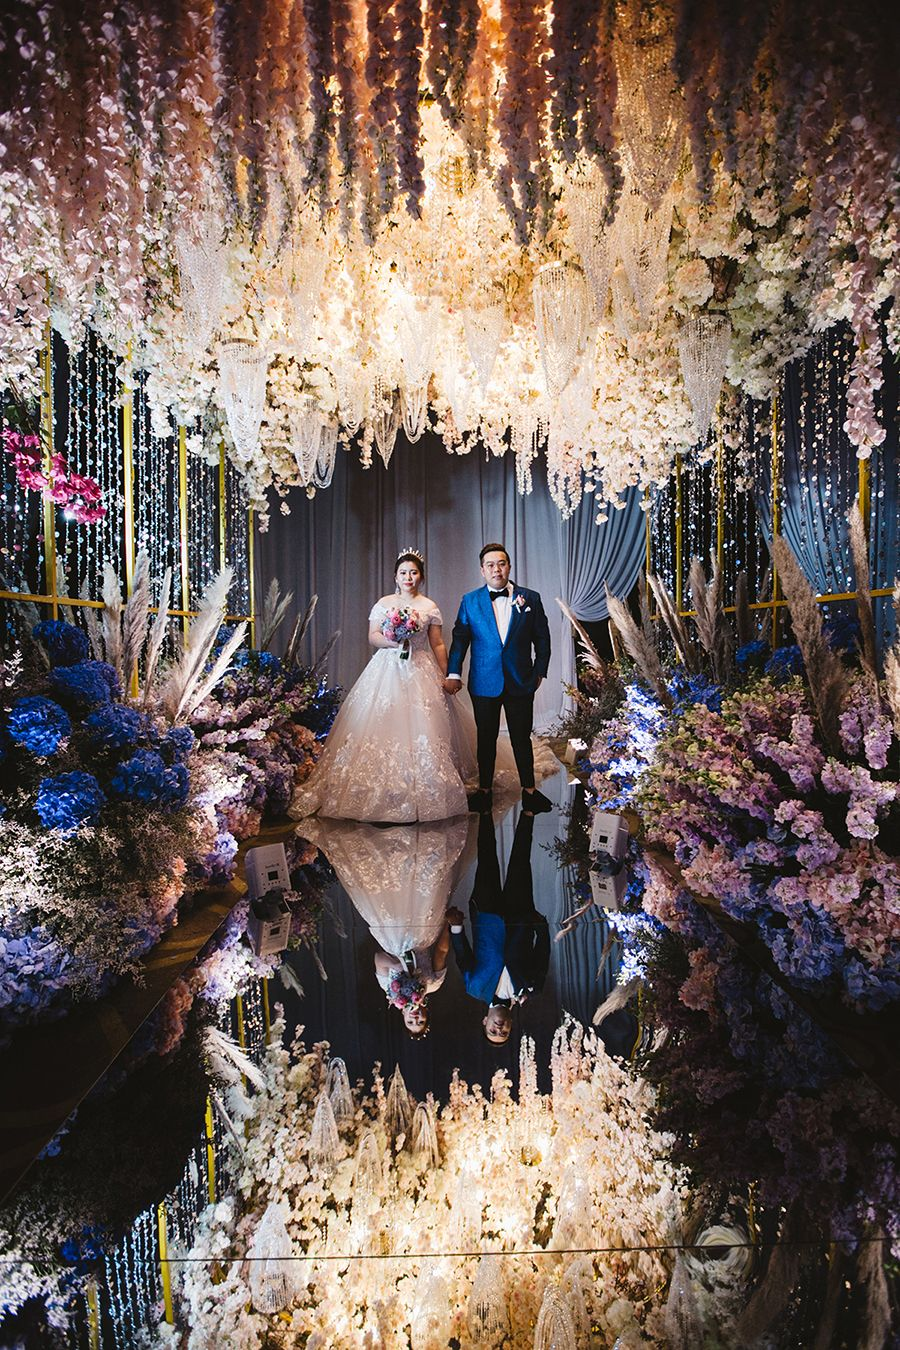 Kelvin And Yiyi S Opulent Wedding Bash In Kuala Lumpur Malaysia Opulent Wedding Ballroom Wedding Reception Wedding Reception Themes